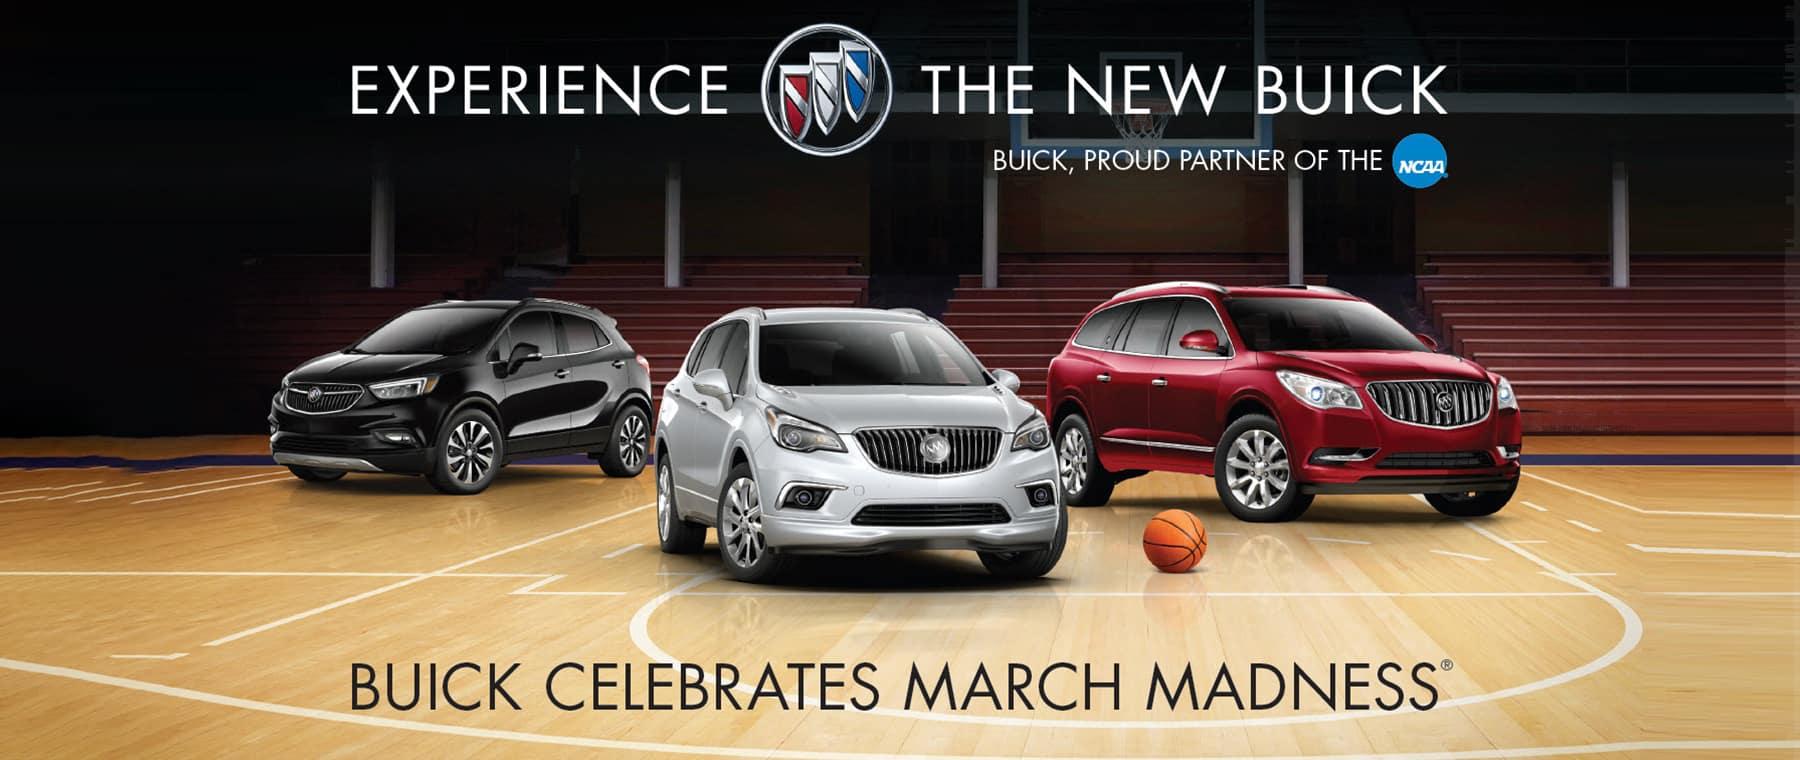 Buick Celebrates March Madness